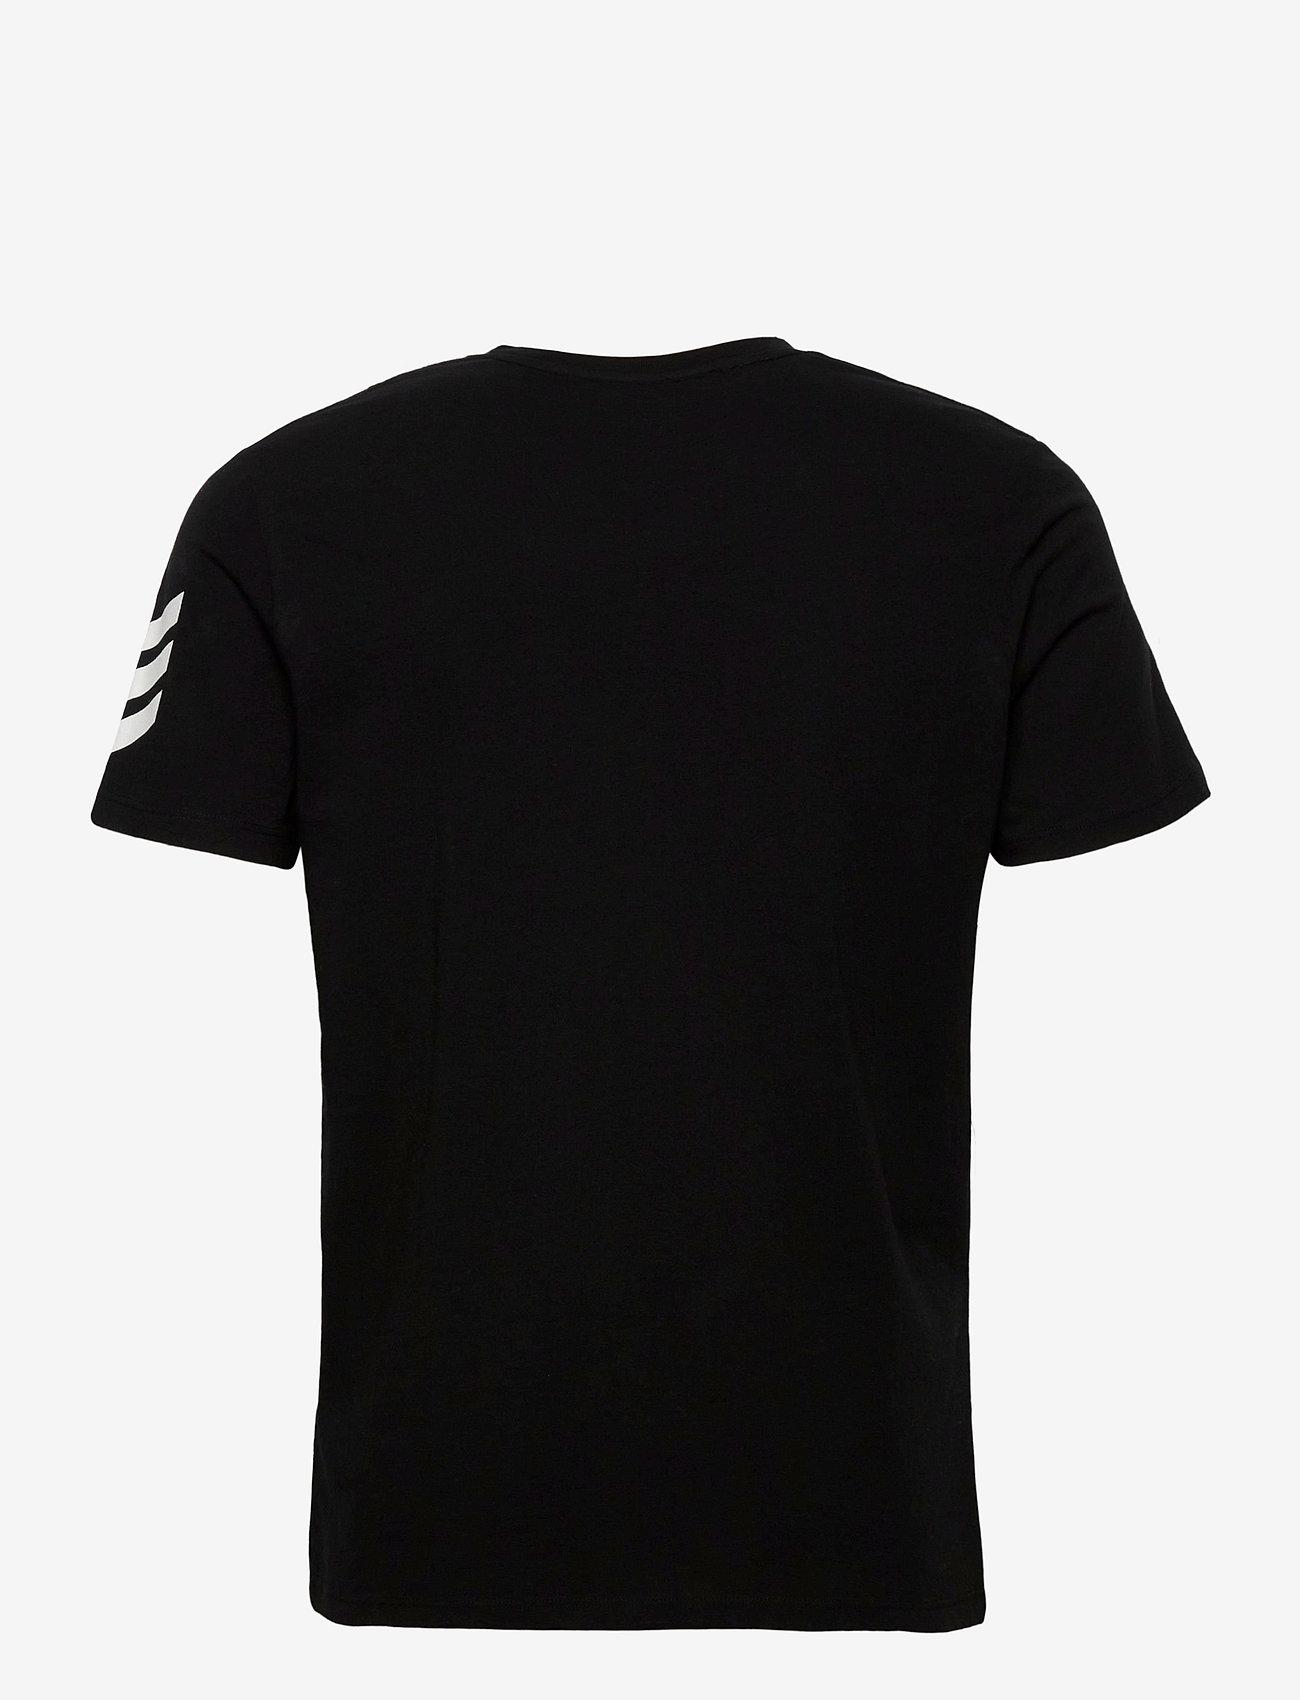 Zadig & Voltaire - TOMMY HC ARROW TEE-SHIRT PRINT ARROW SLEEVE - basic t-shirts - black - 1